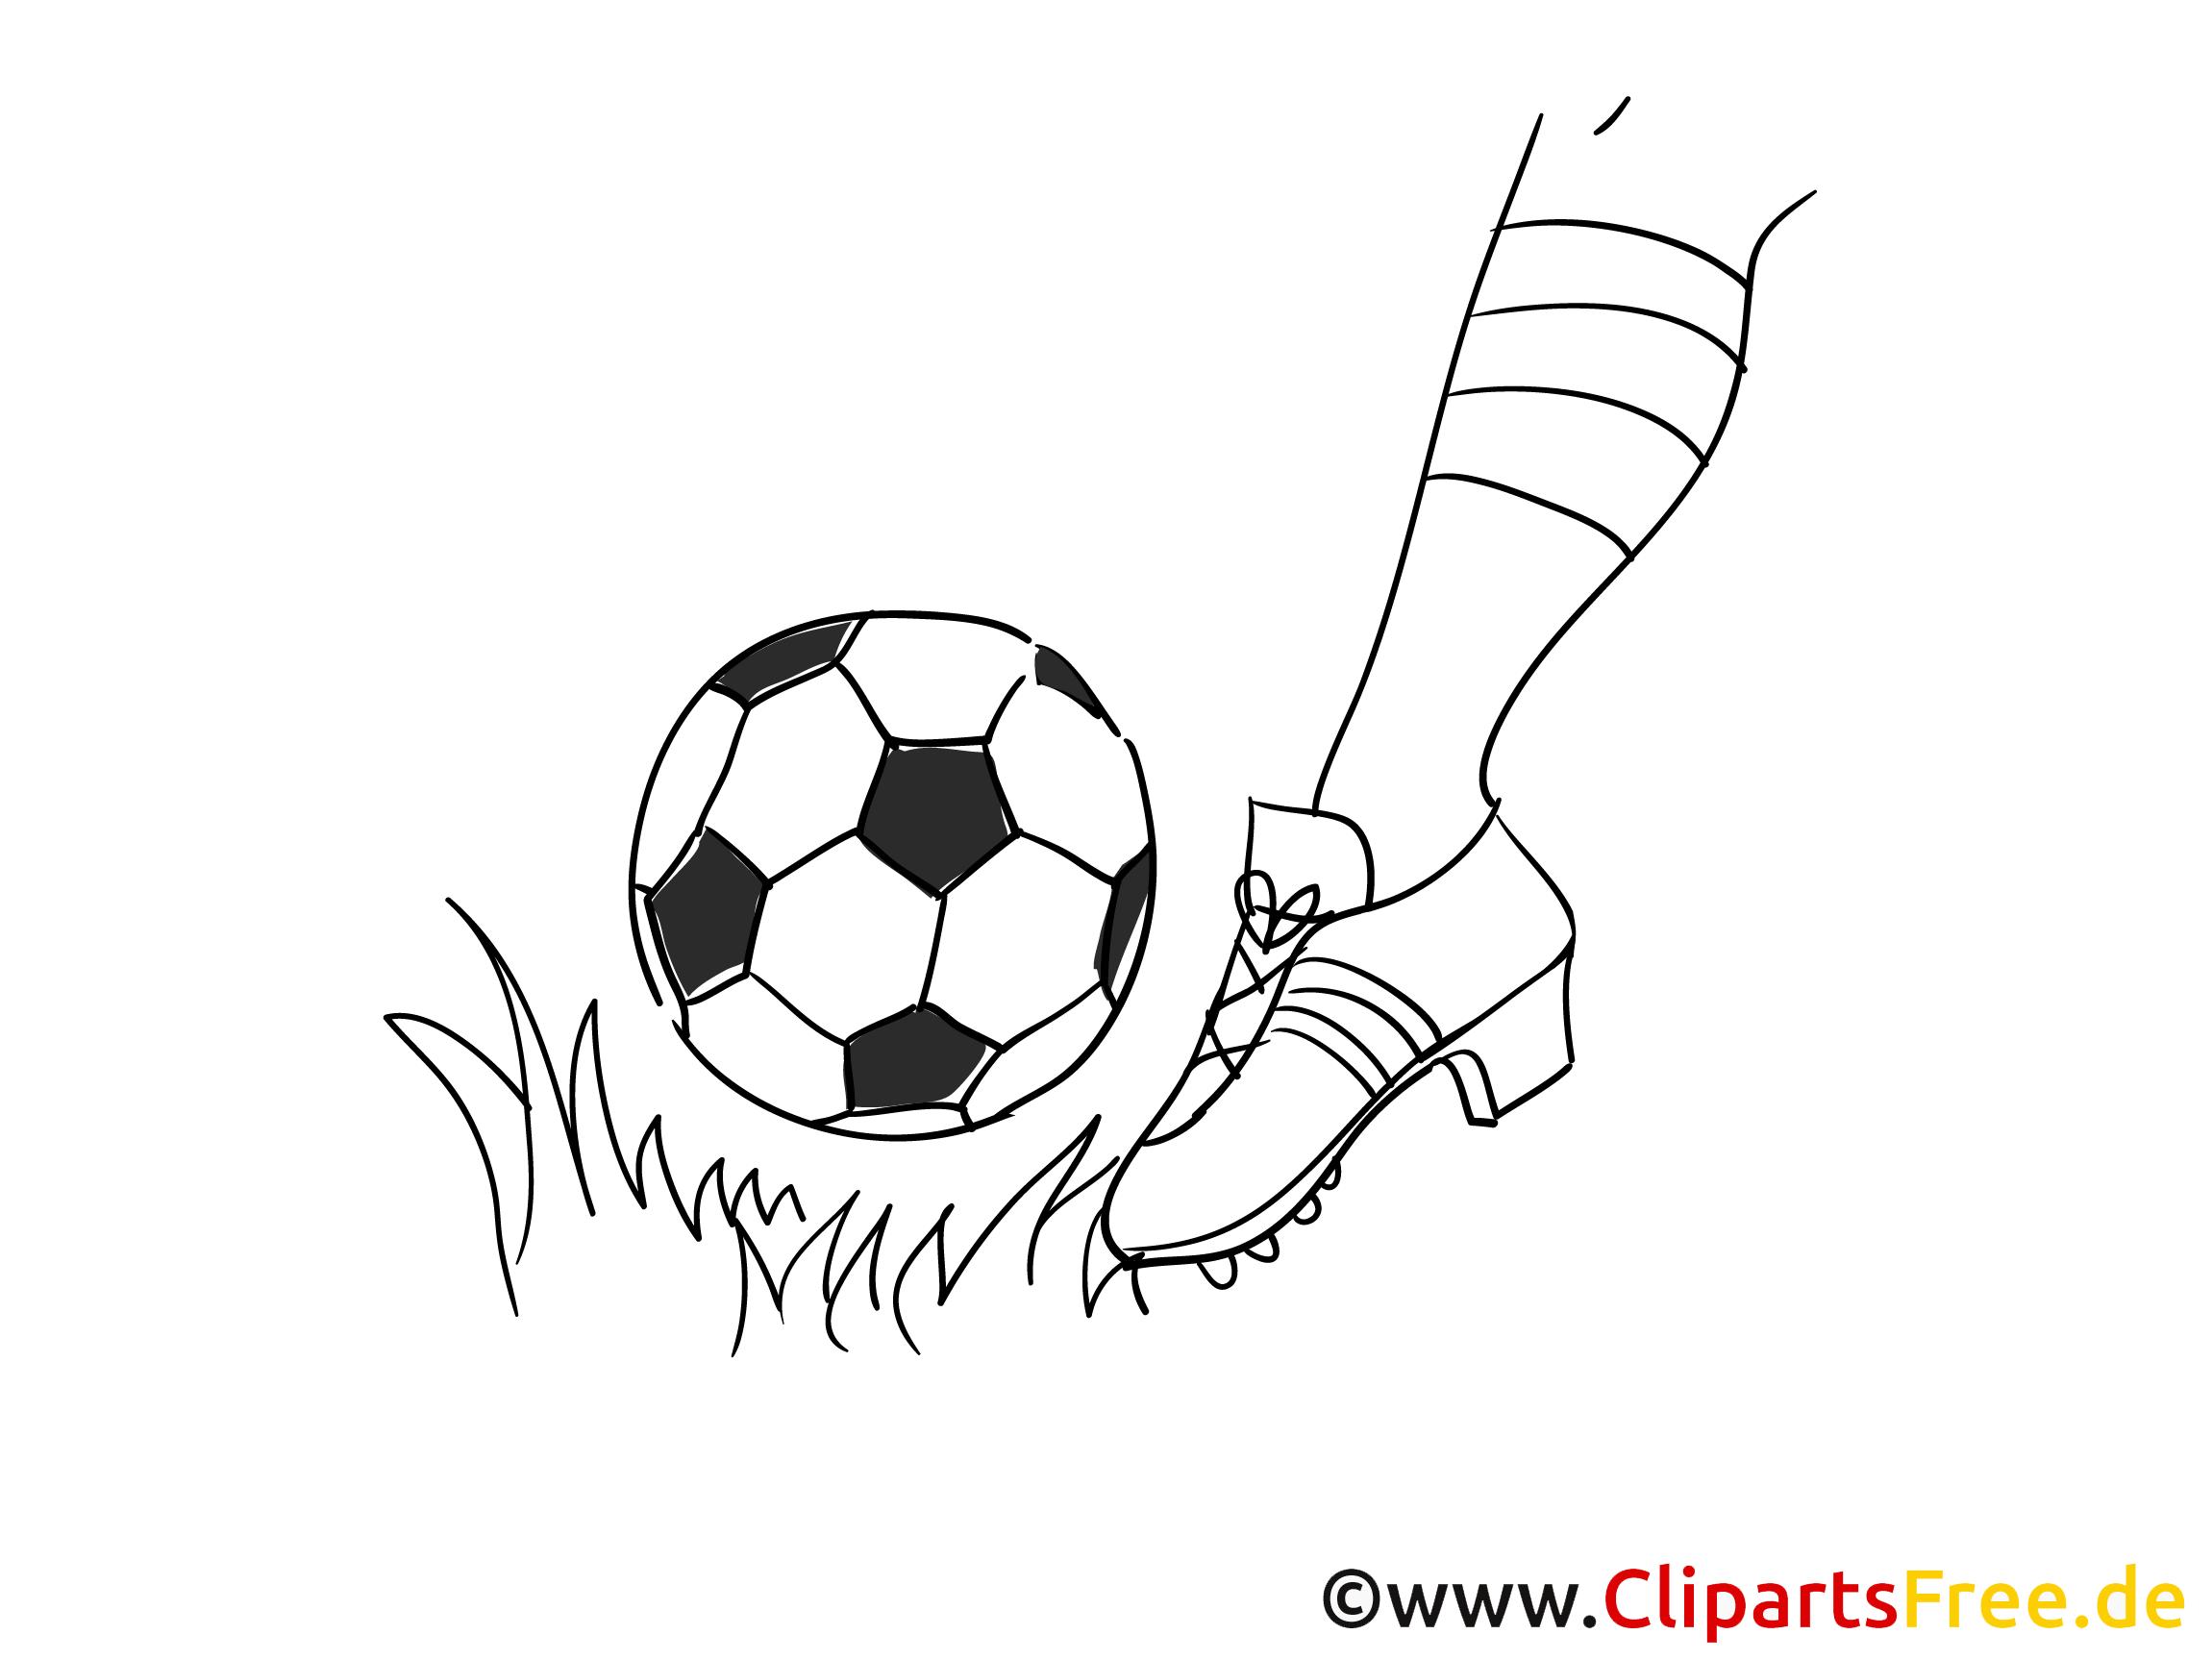 Schuss Fussball Bild zum Ausmalen